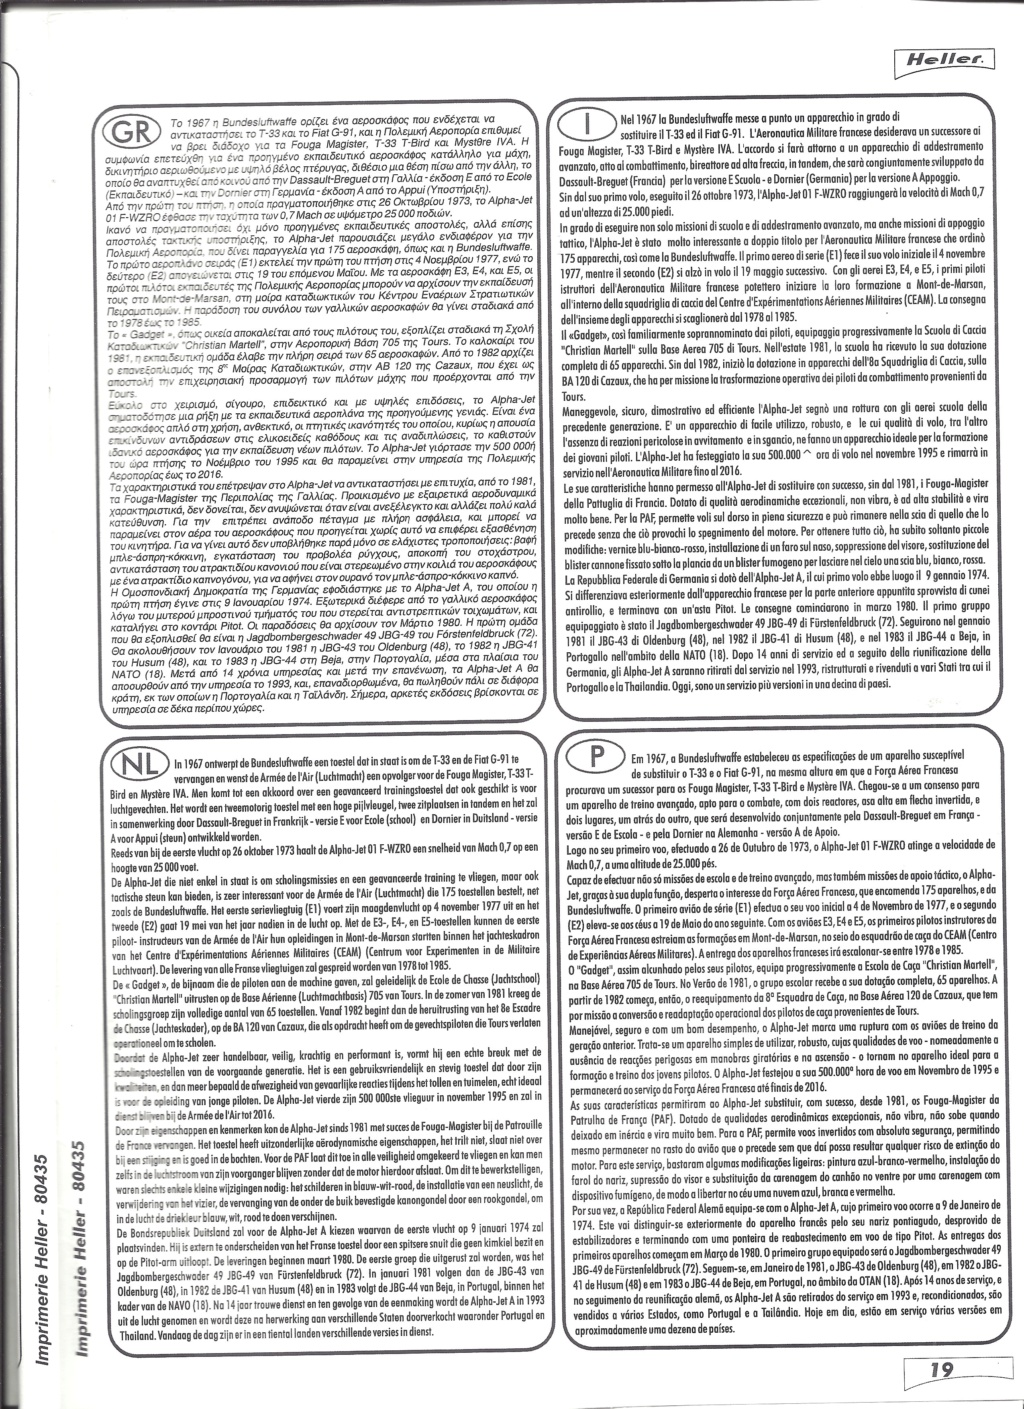 DASSAULT-BREGUET / DORNIER ALPHA JET 1/48ème Réf 80435 Notice Helle674